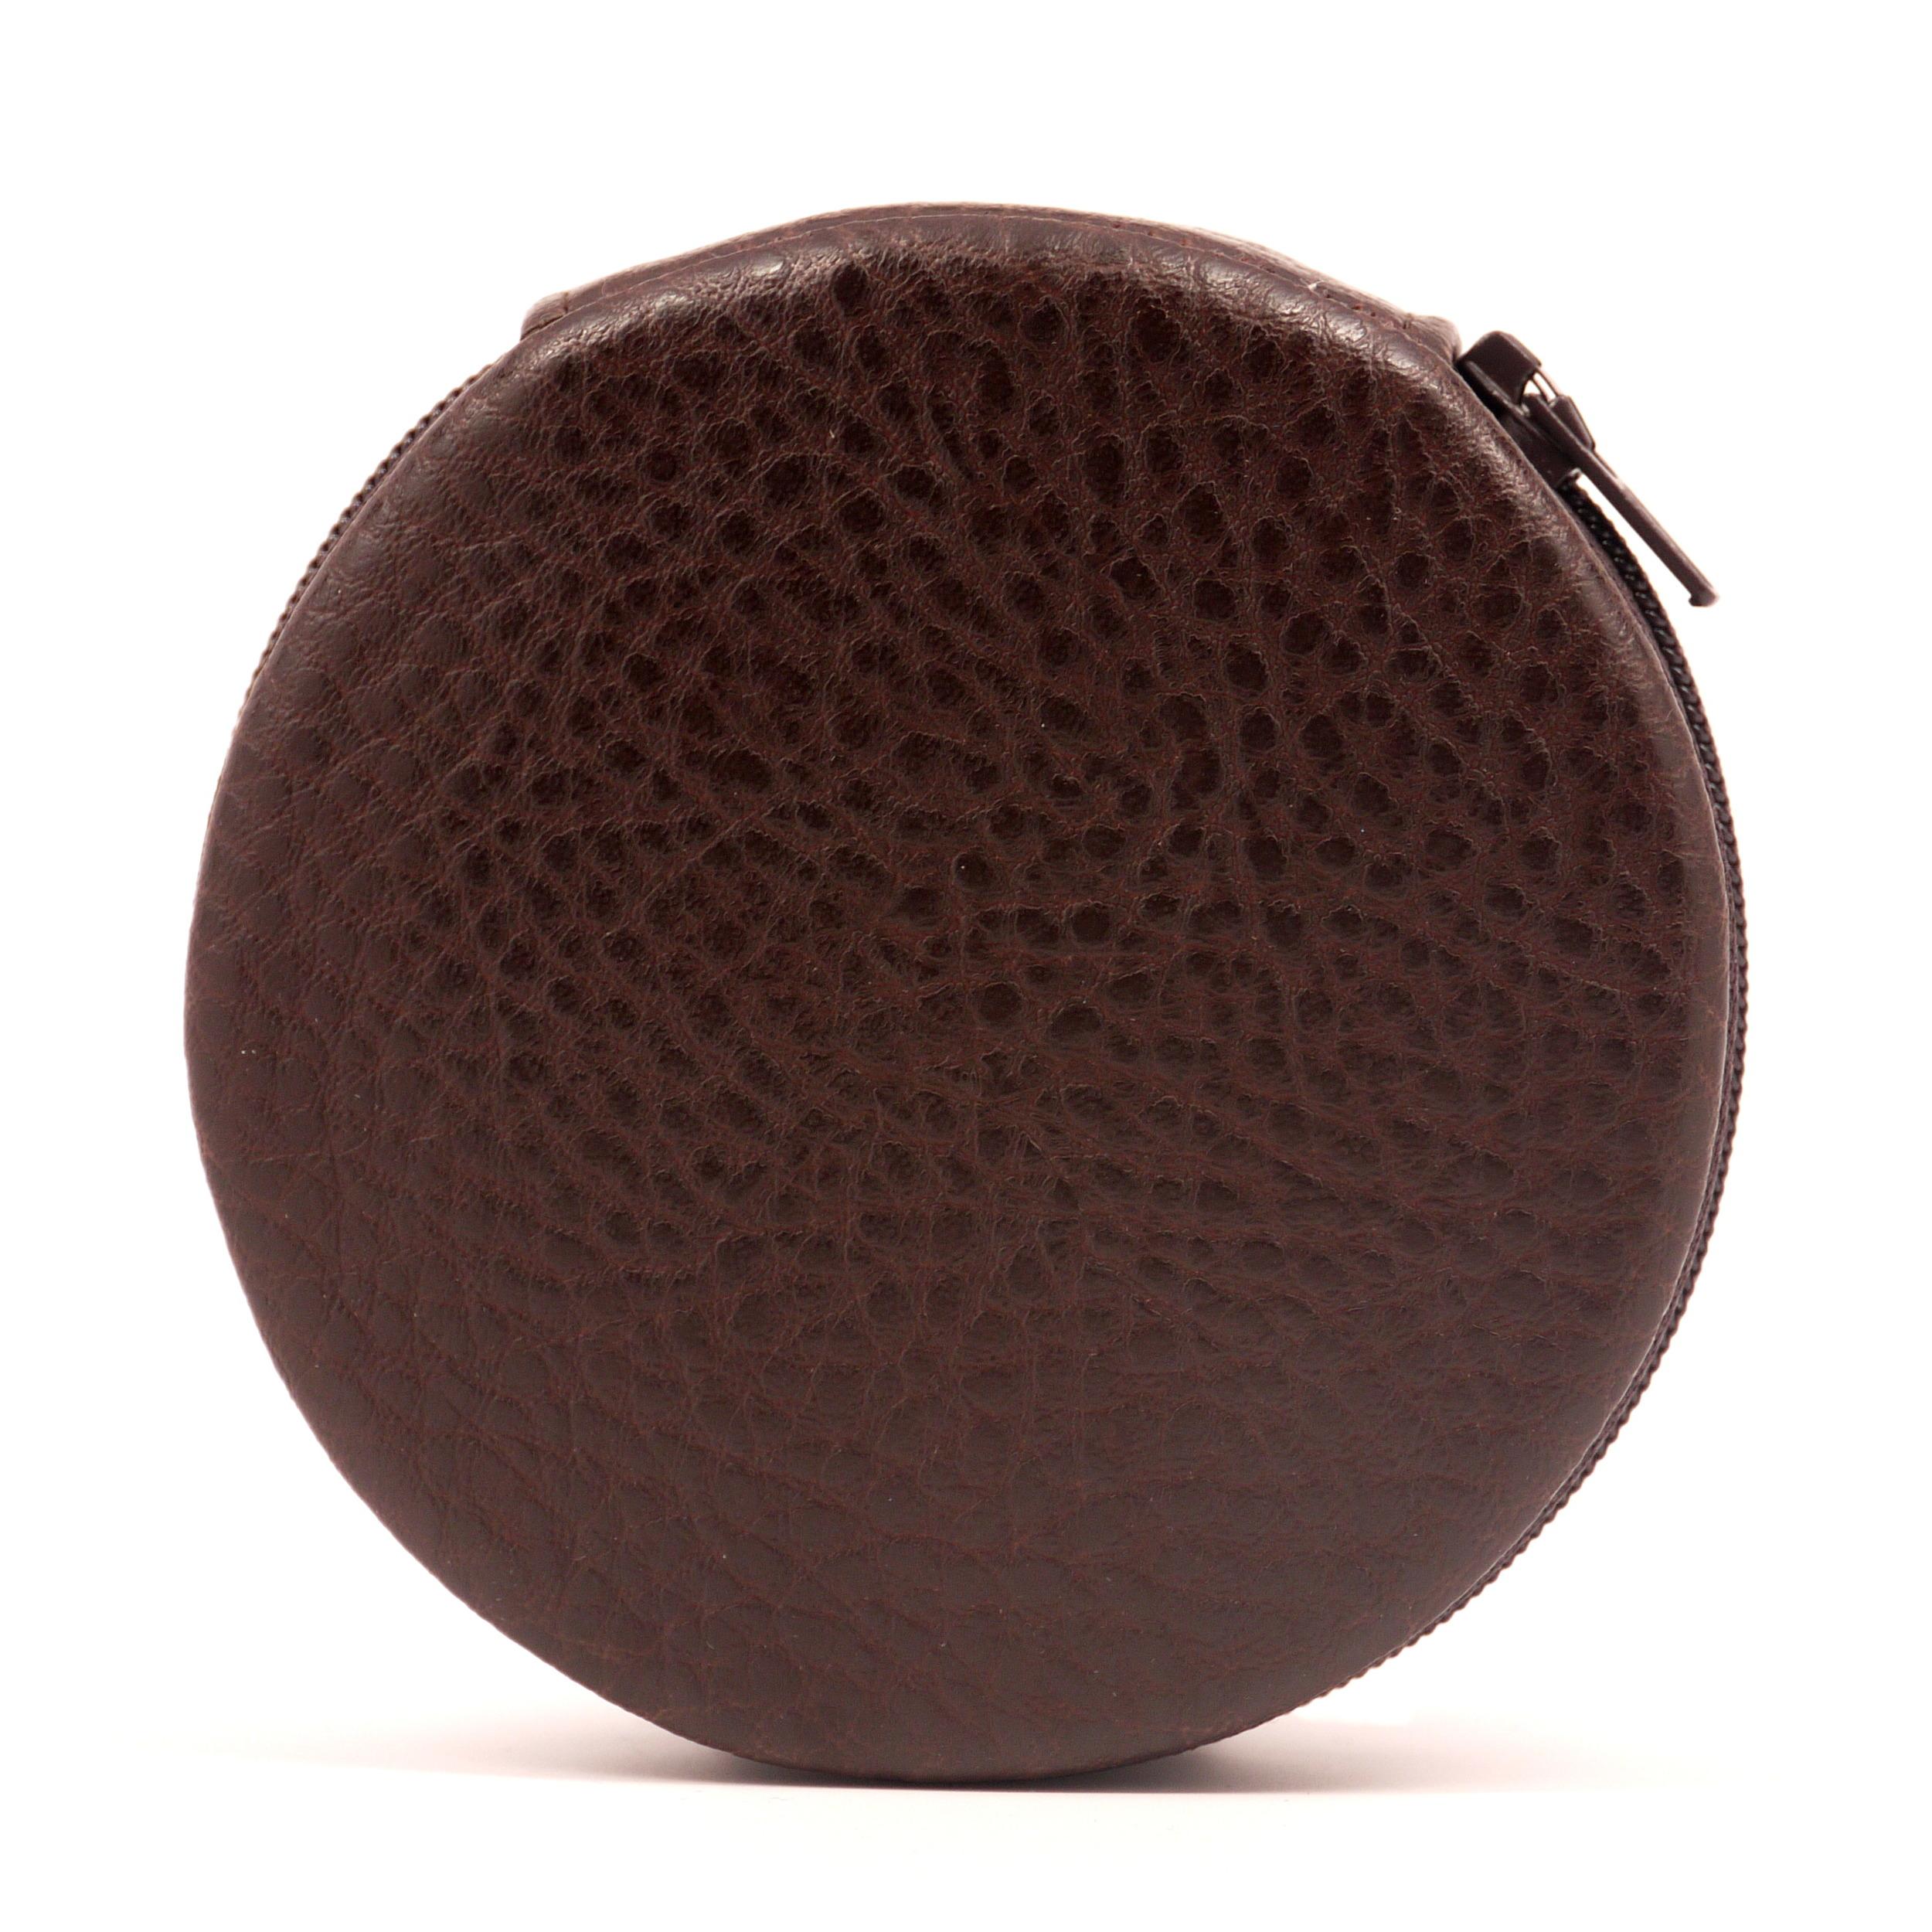 Brown Pebble Zip-A-Round Pill Organizer